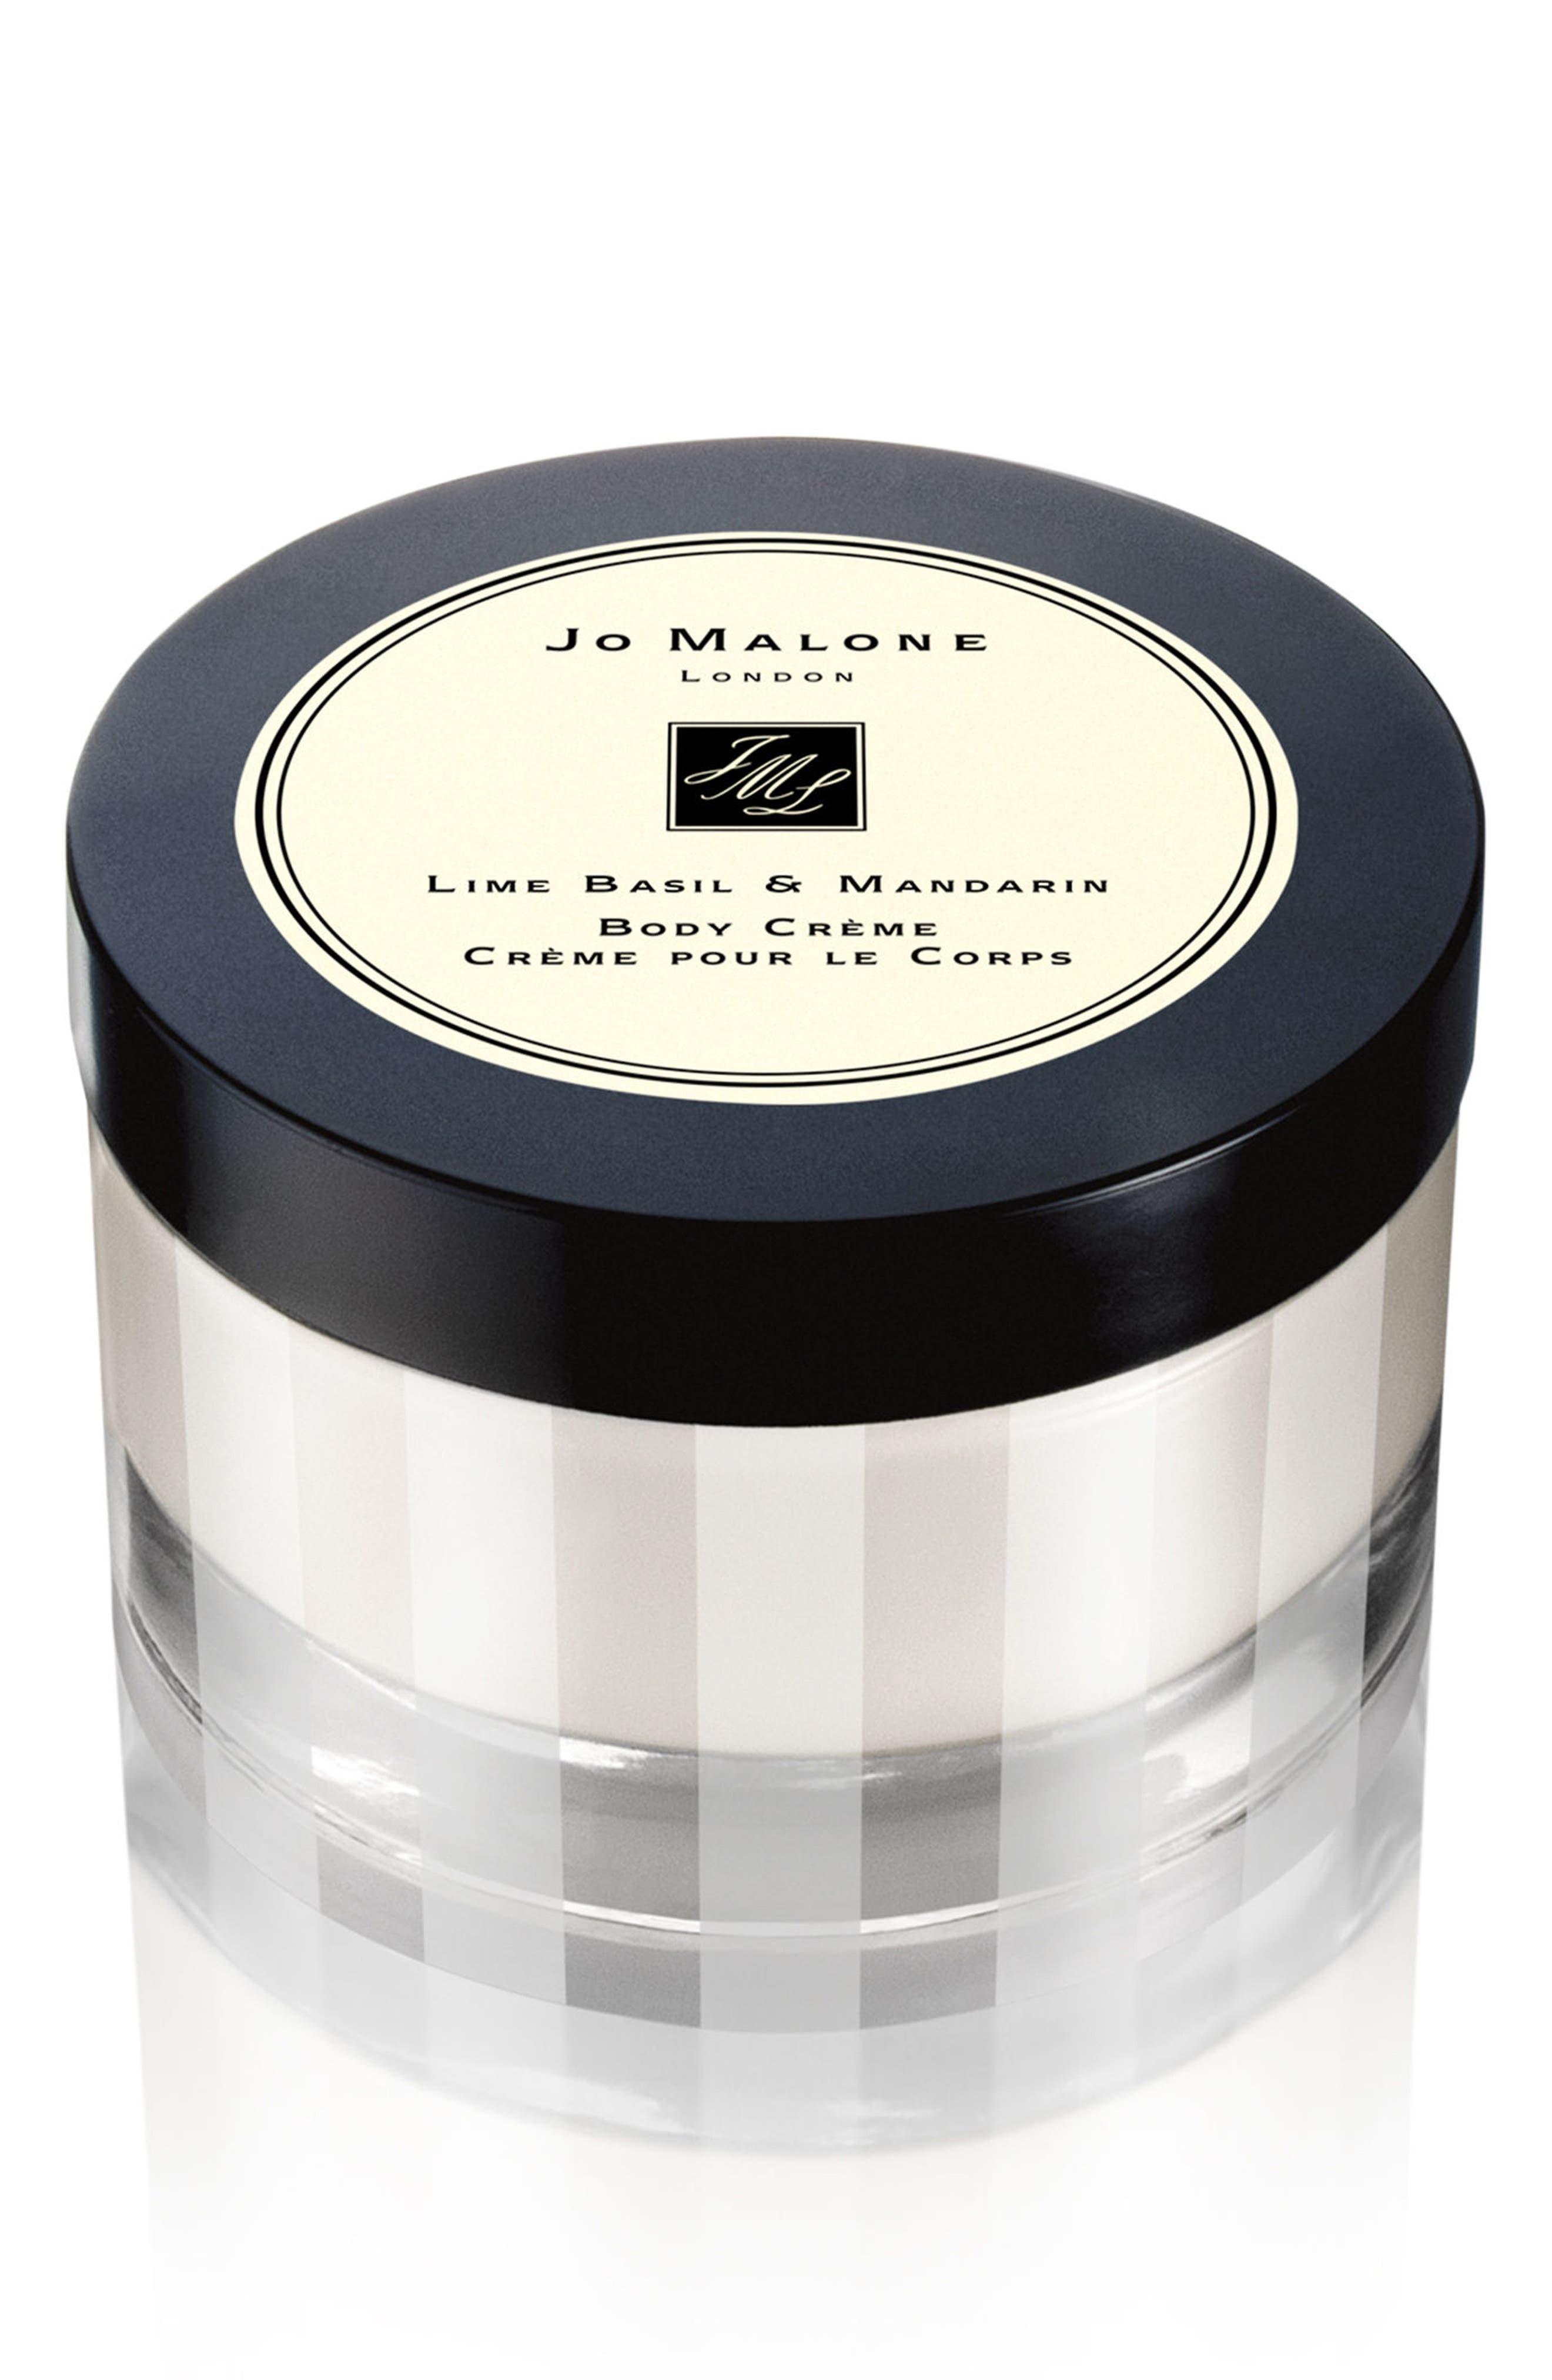 Jo Malone London™ 'Lime Basil & Mandarin' Body Crème